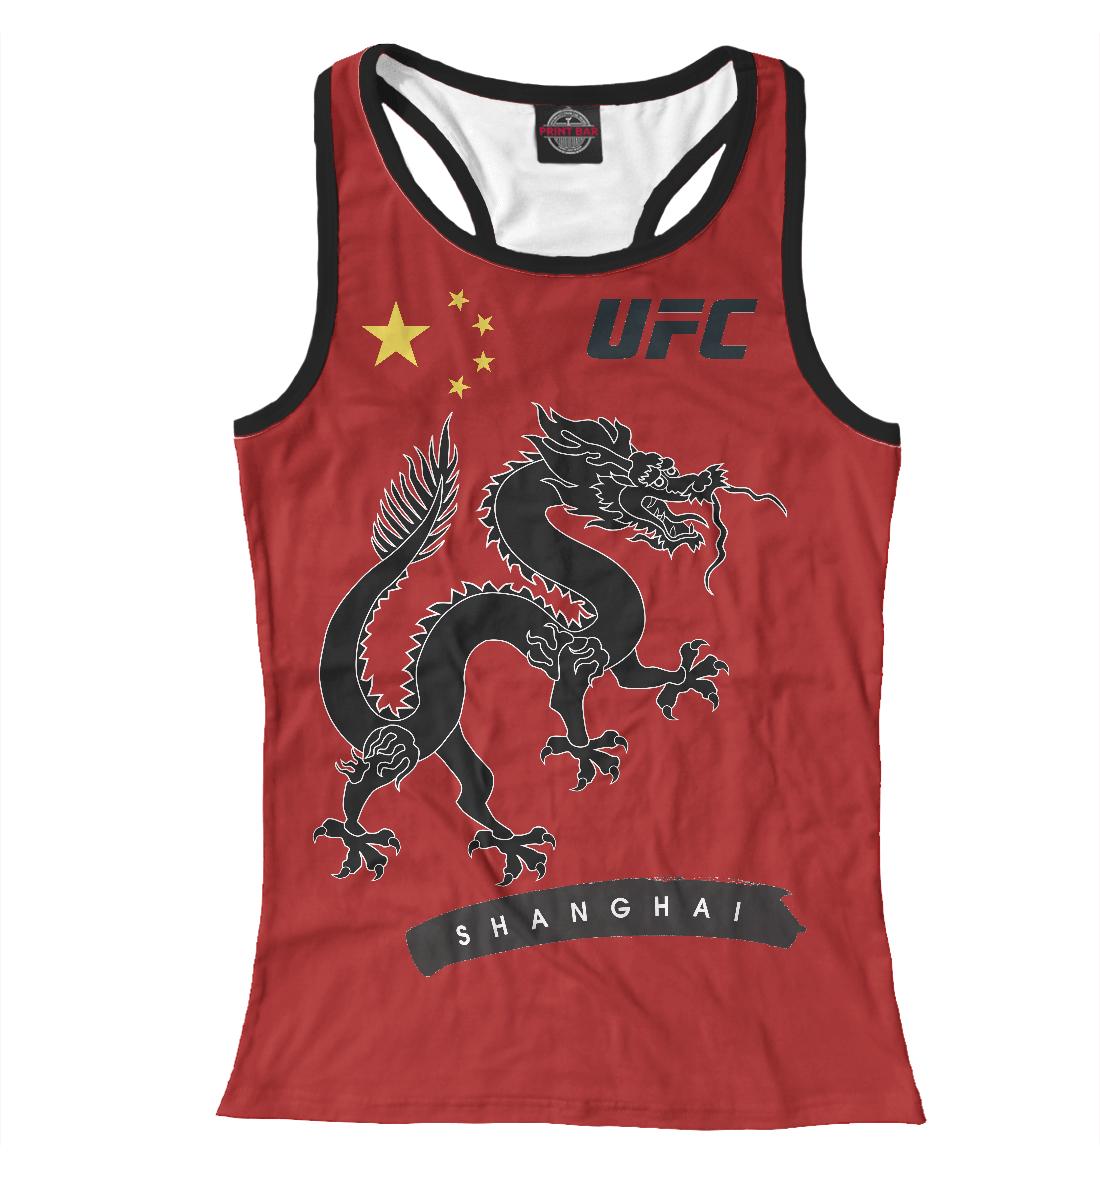 Купить UFC SHANGHAI, Printbar, Майки борцовки, MNU-773763-mayb-1